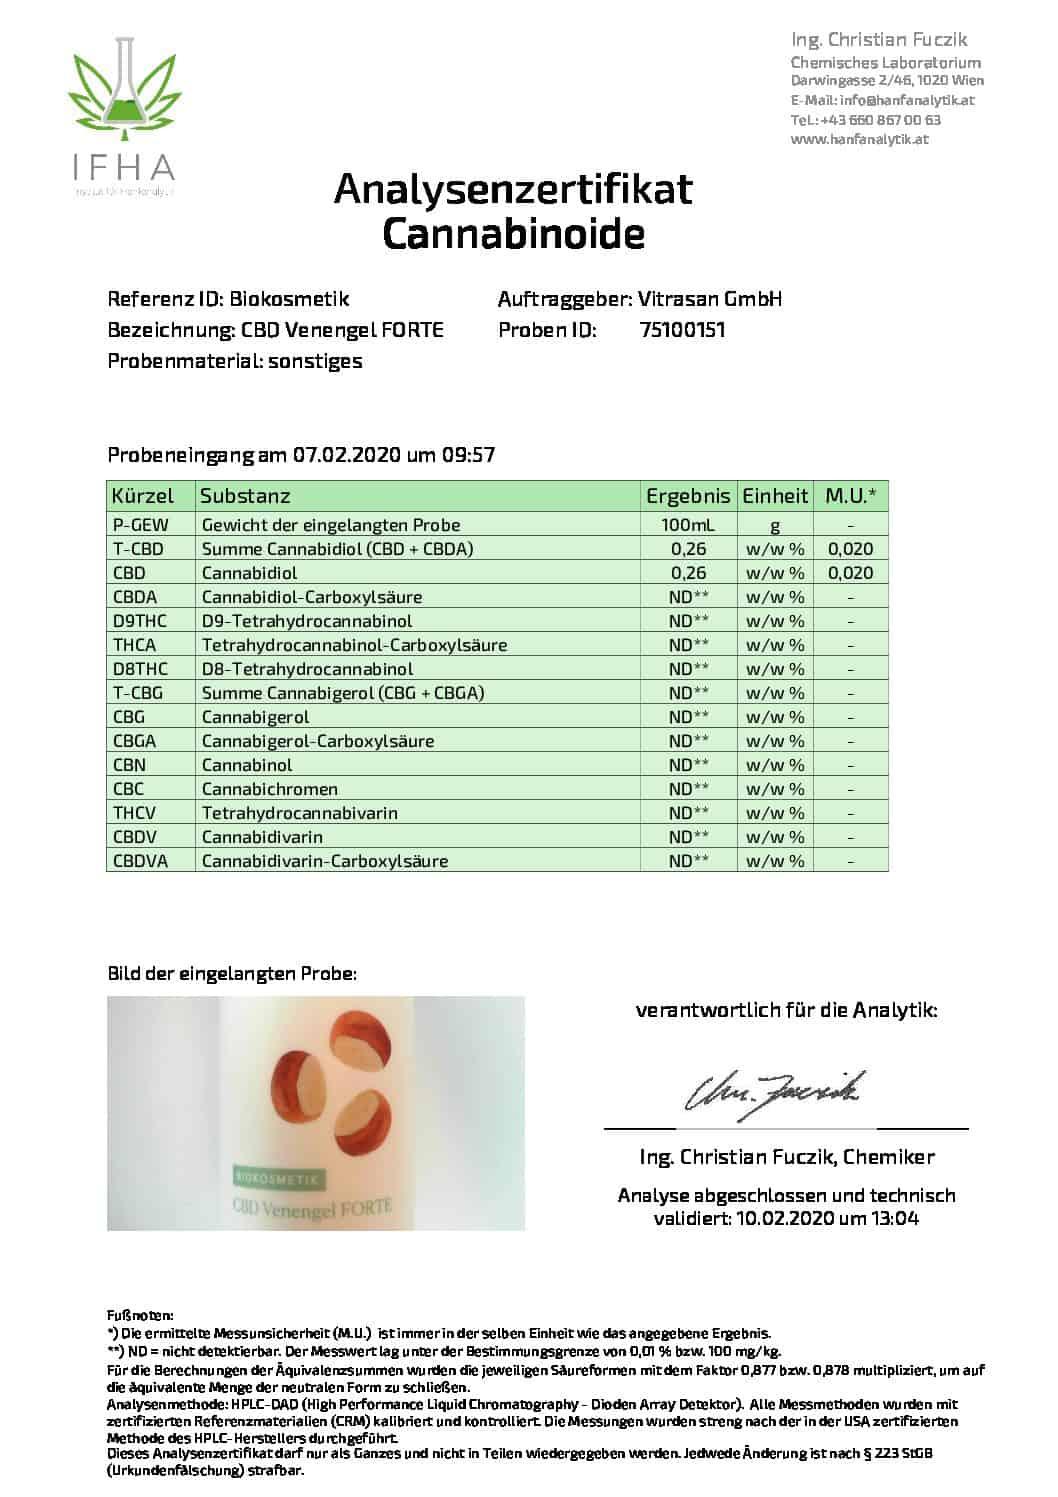 cbd магазин - biokosmetik analysenzertifikat venengel 02 2020 pdf